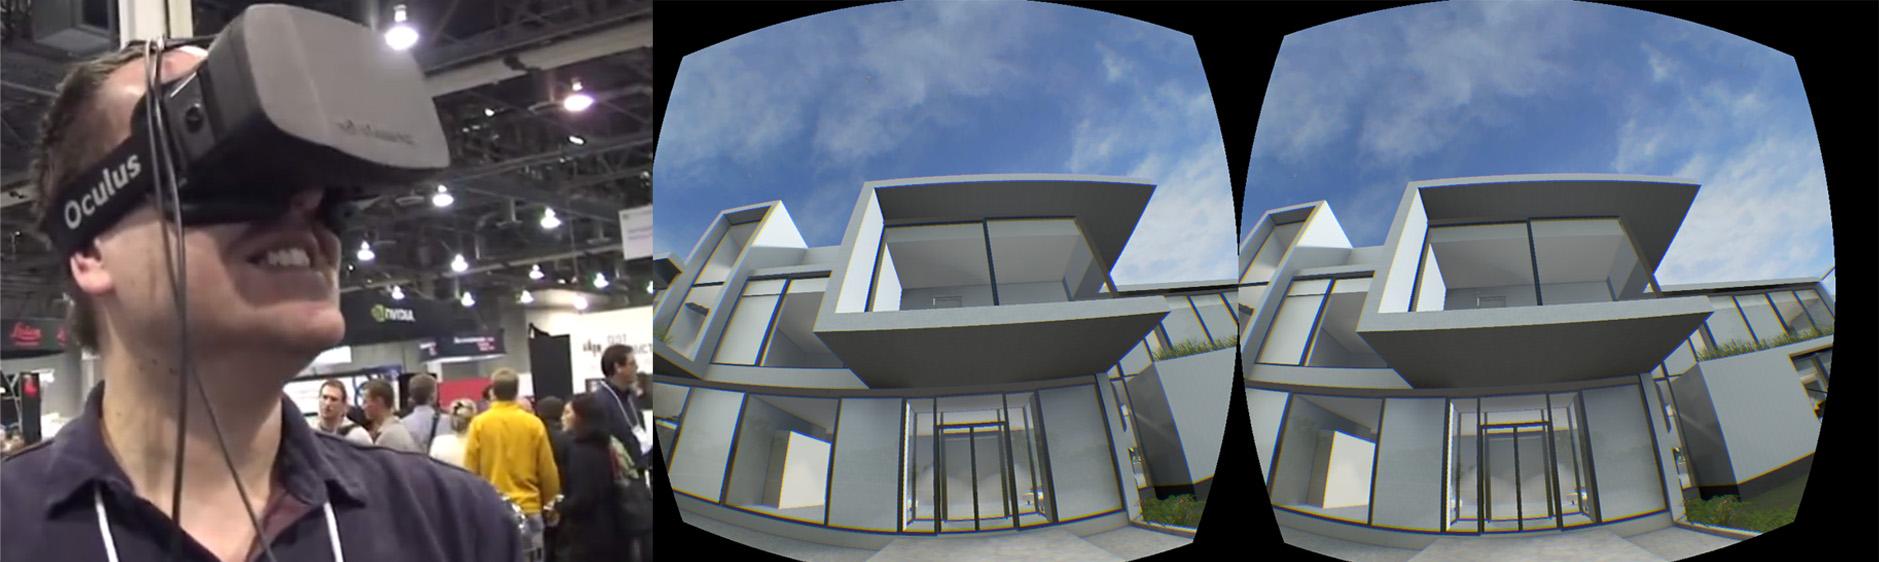 BIM Goes Virtual: Oculus Rift and Virtual Reality Take